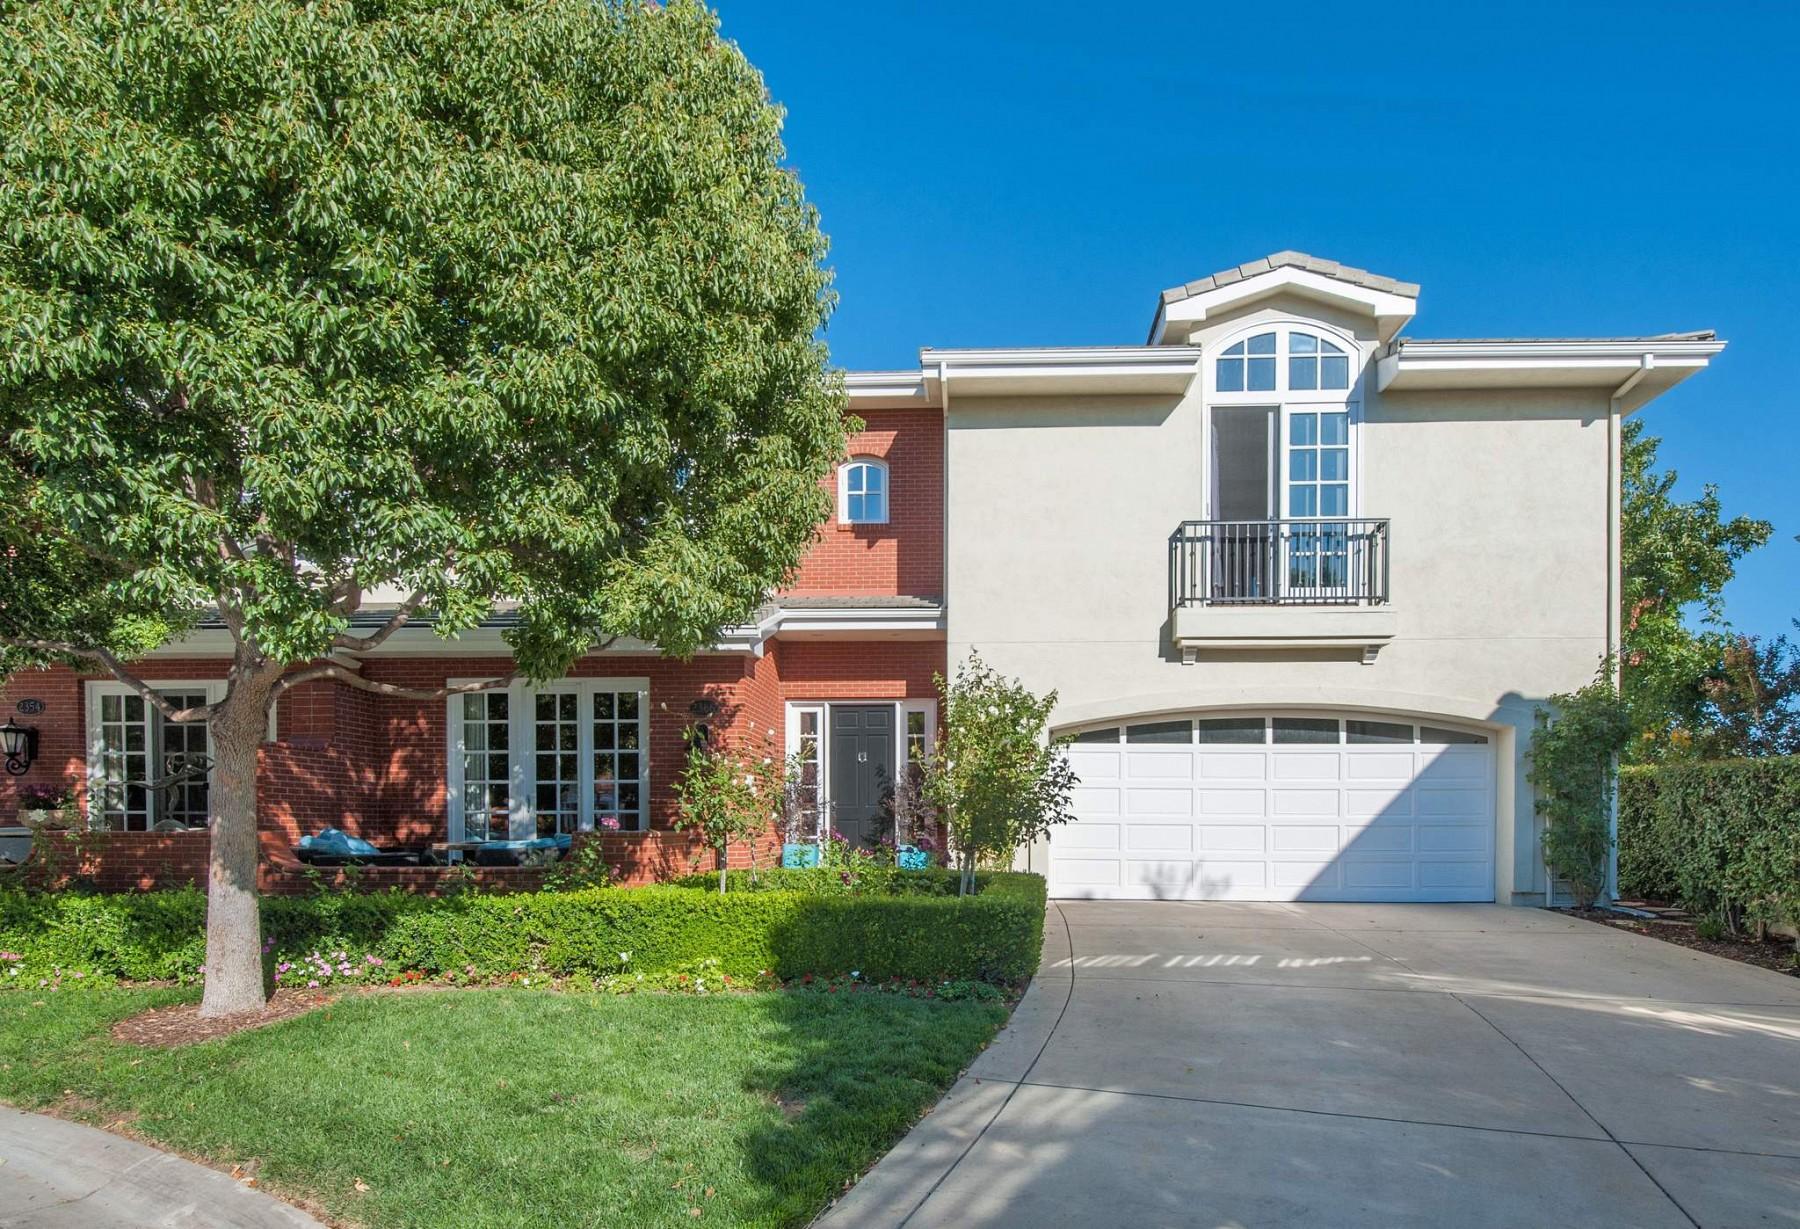 2366 Heatherbank Court, Thousand Oaks, CA 91361